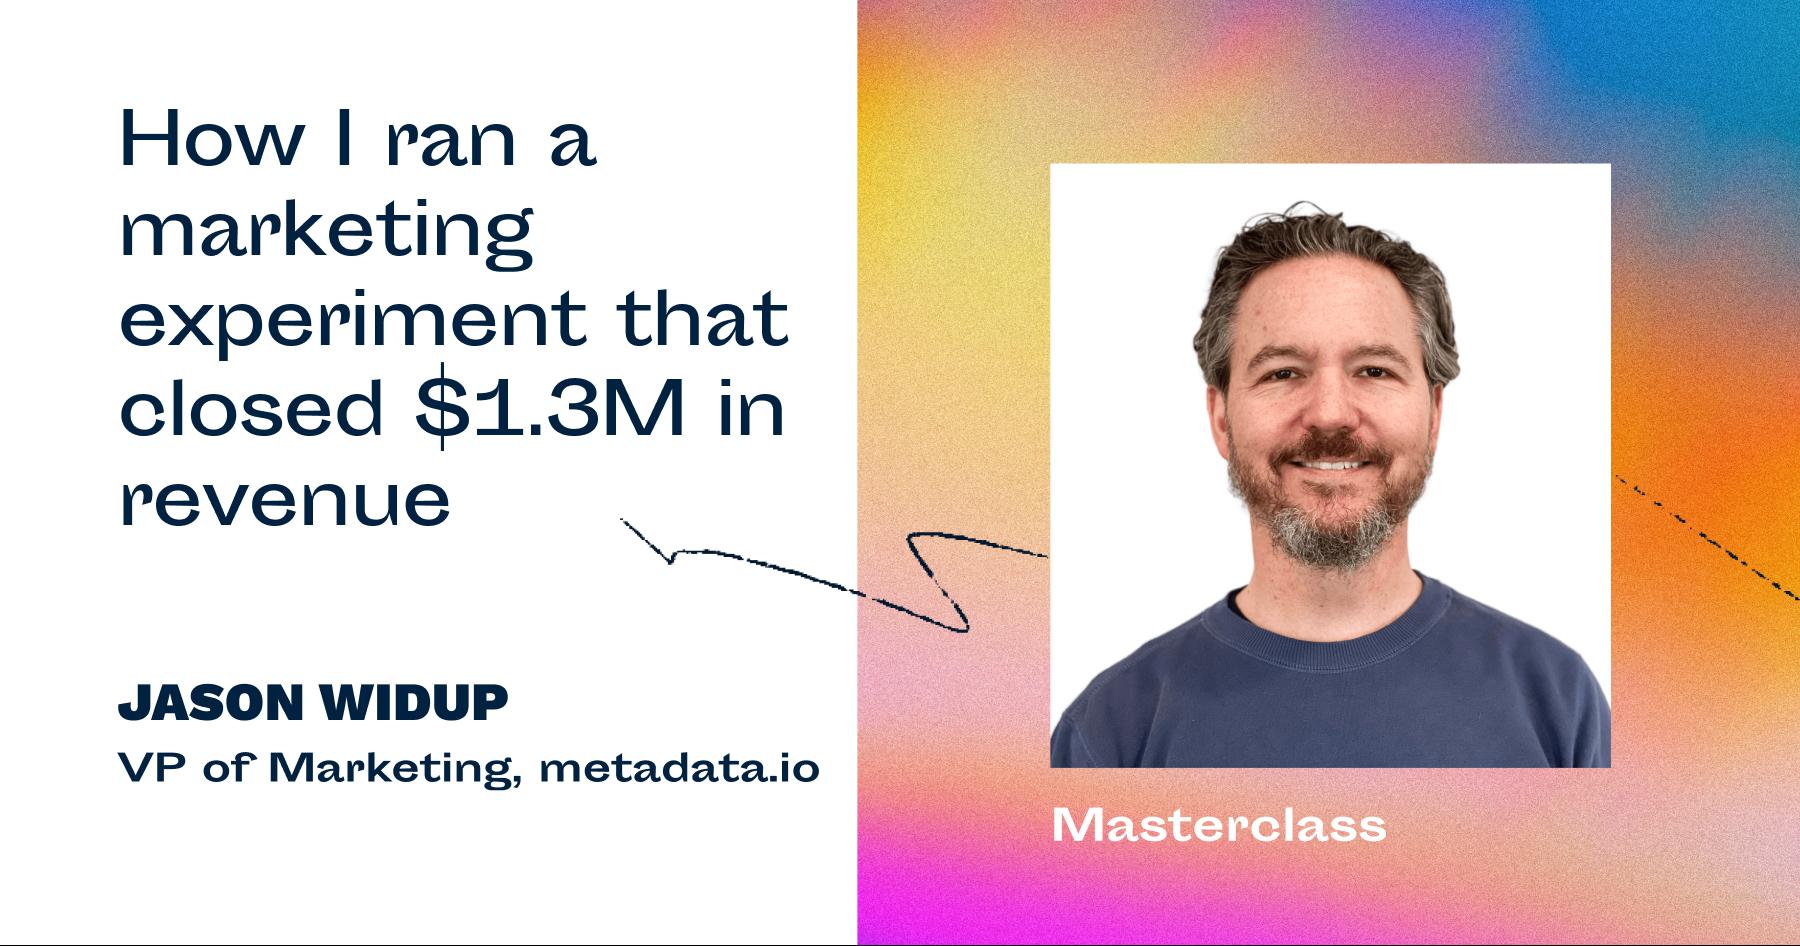 🎧 Masterclass on Experiments with Jason Widup, VP Marketing @ Metadata